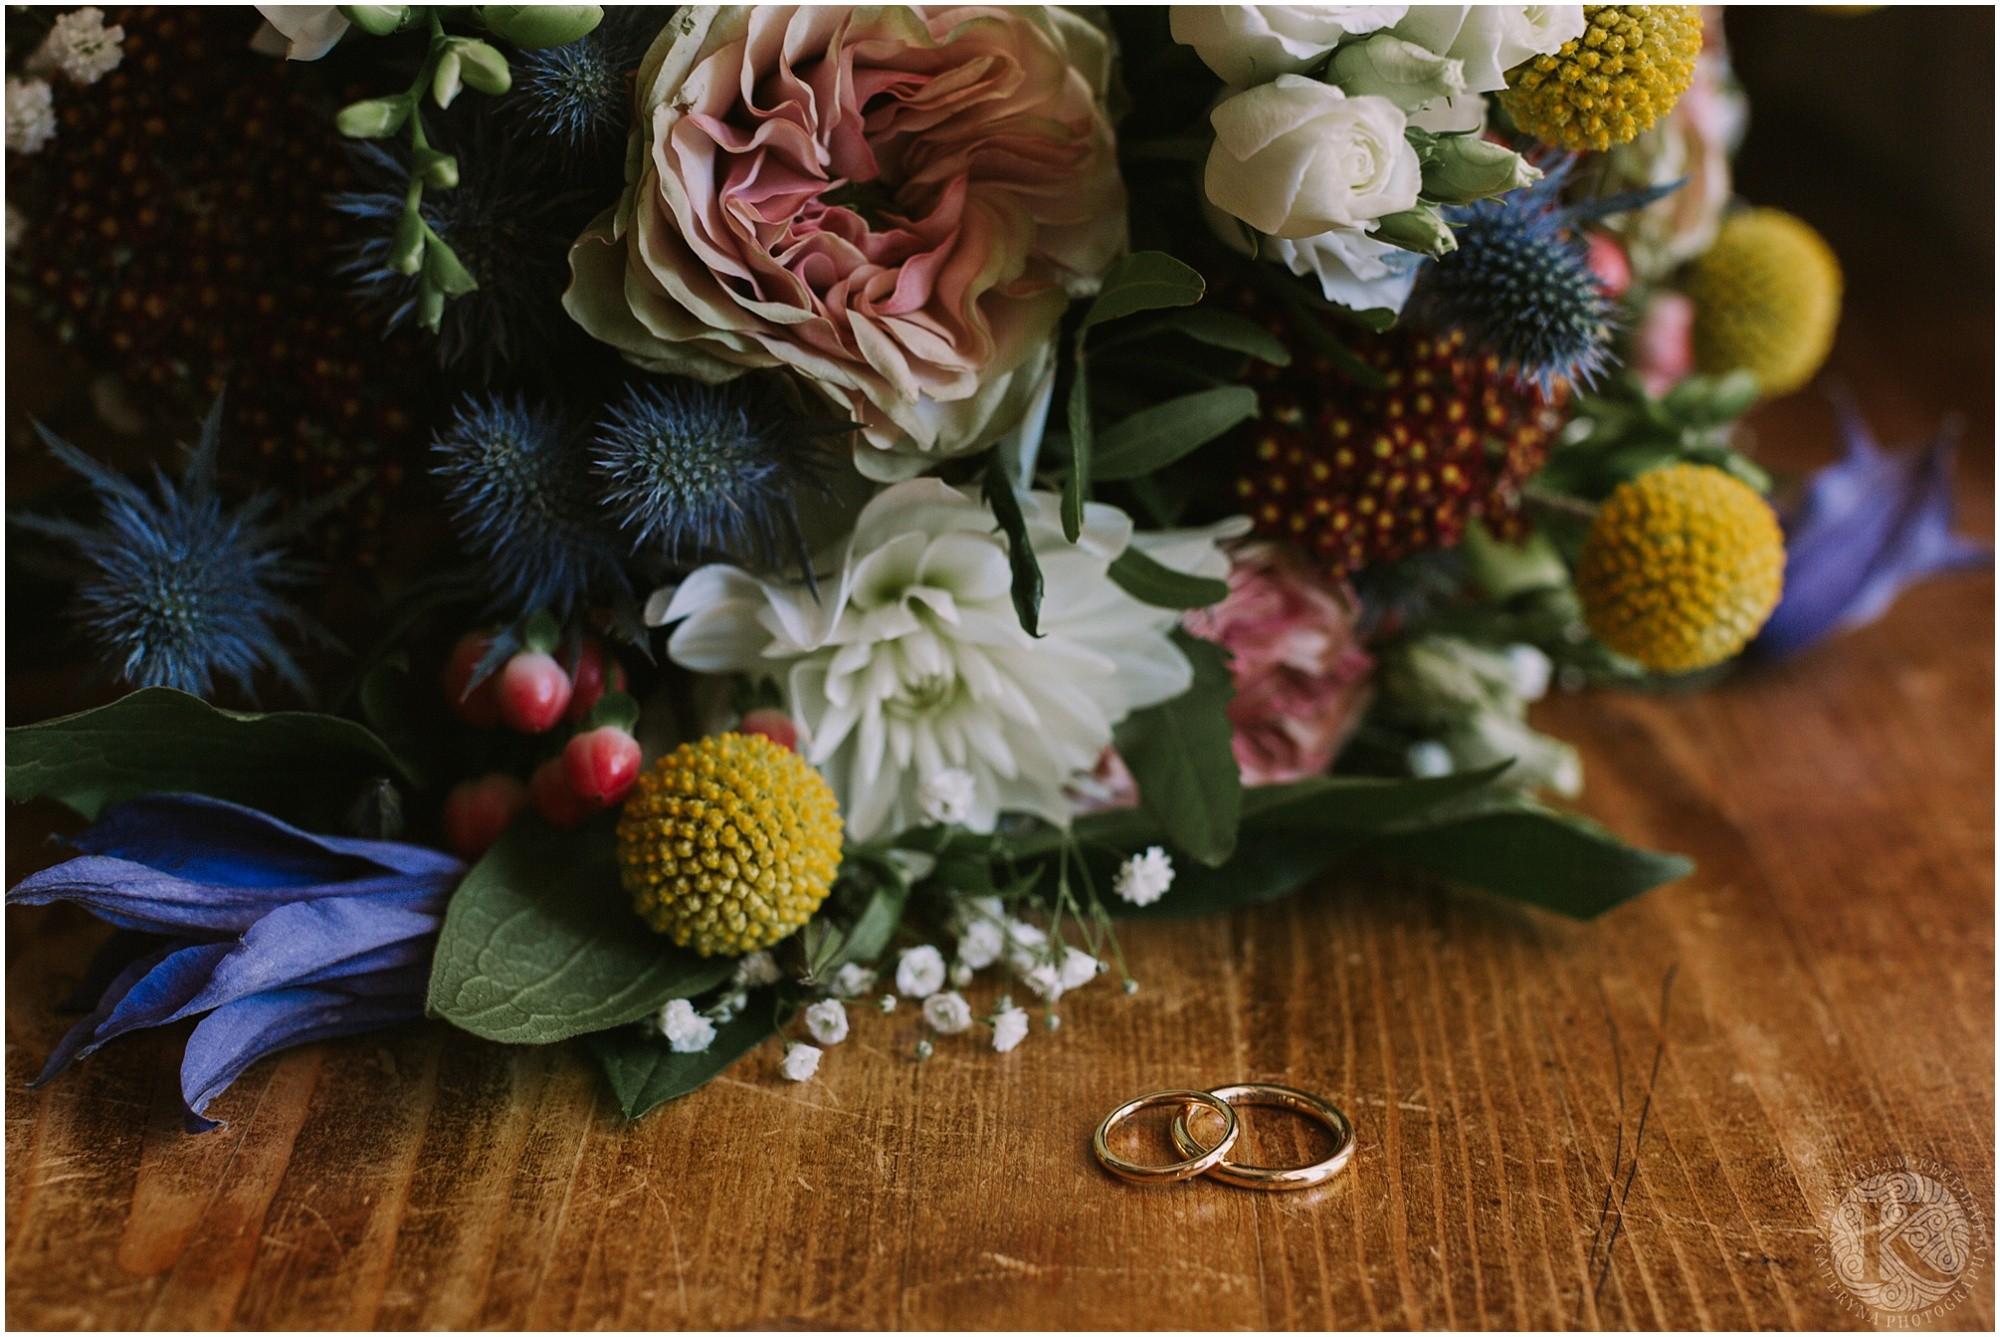 Kateryna-photos-photographe-mariage-vaucluse-provence-avignon-ferme-st-hugues_0010.jpg